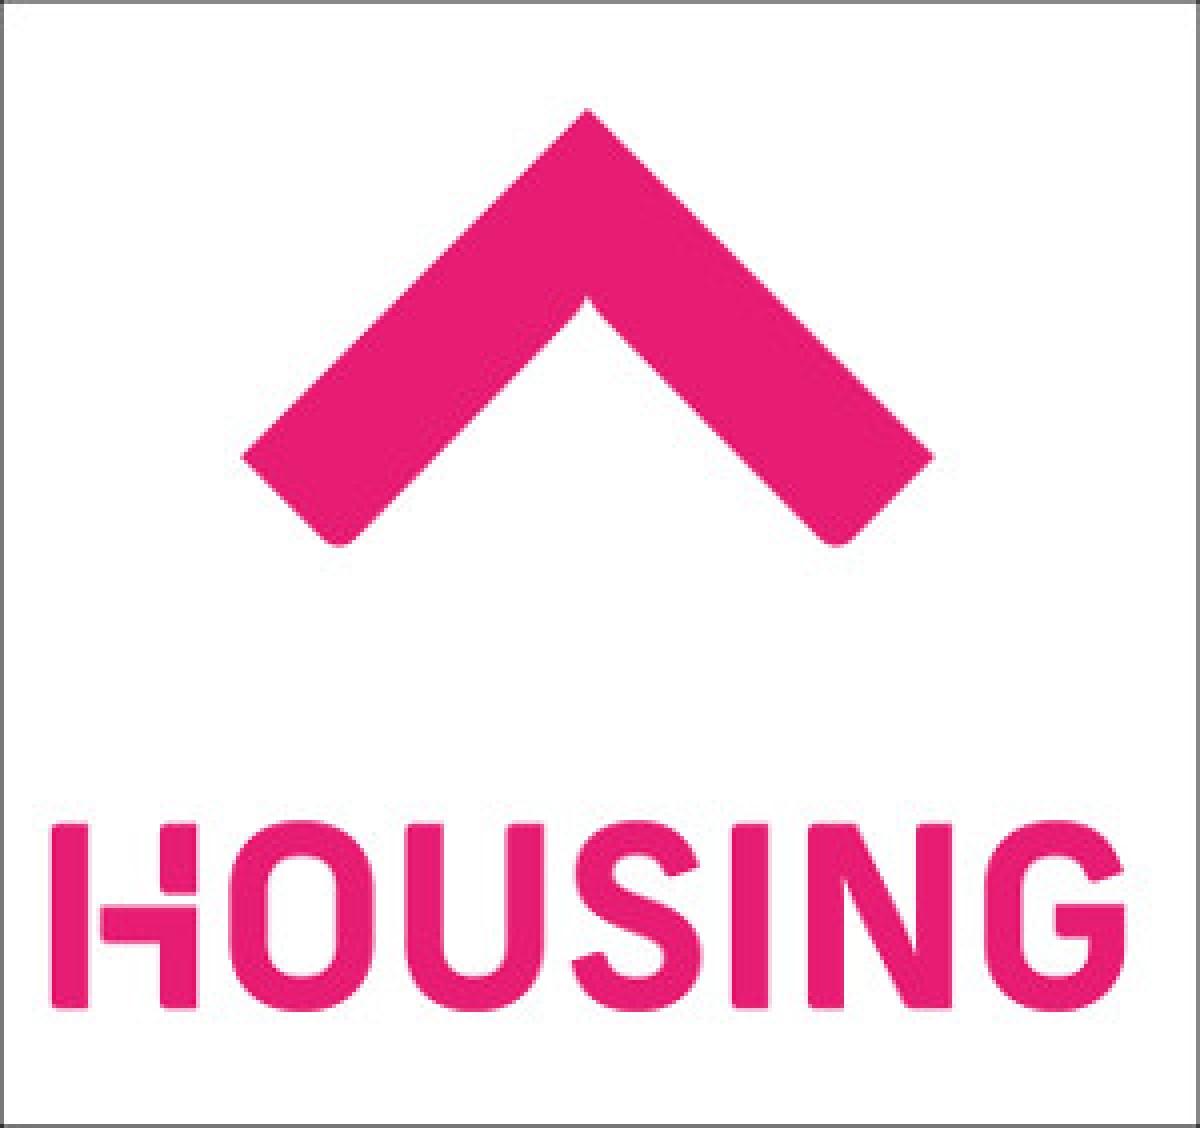 Nikhil Rungta joins Housing.com as CMO